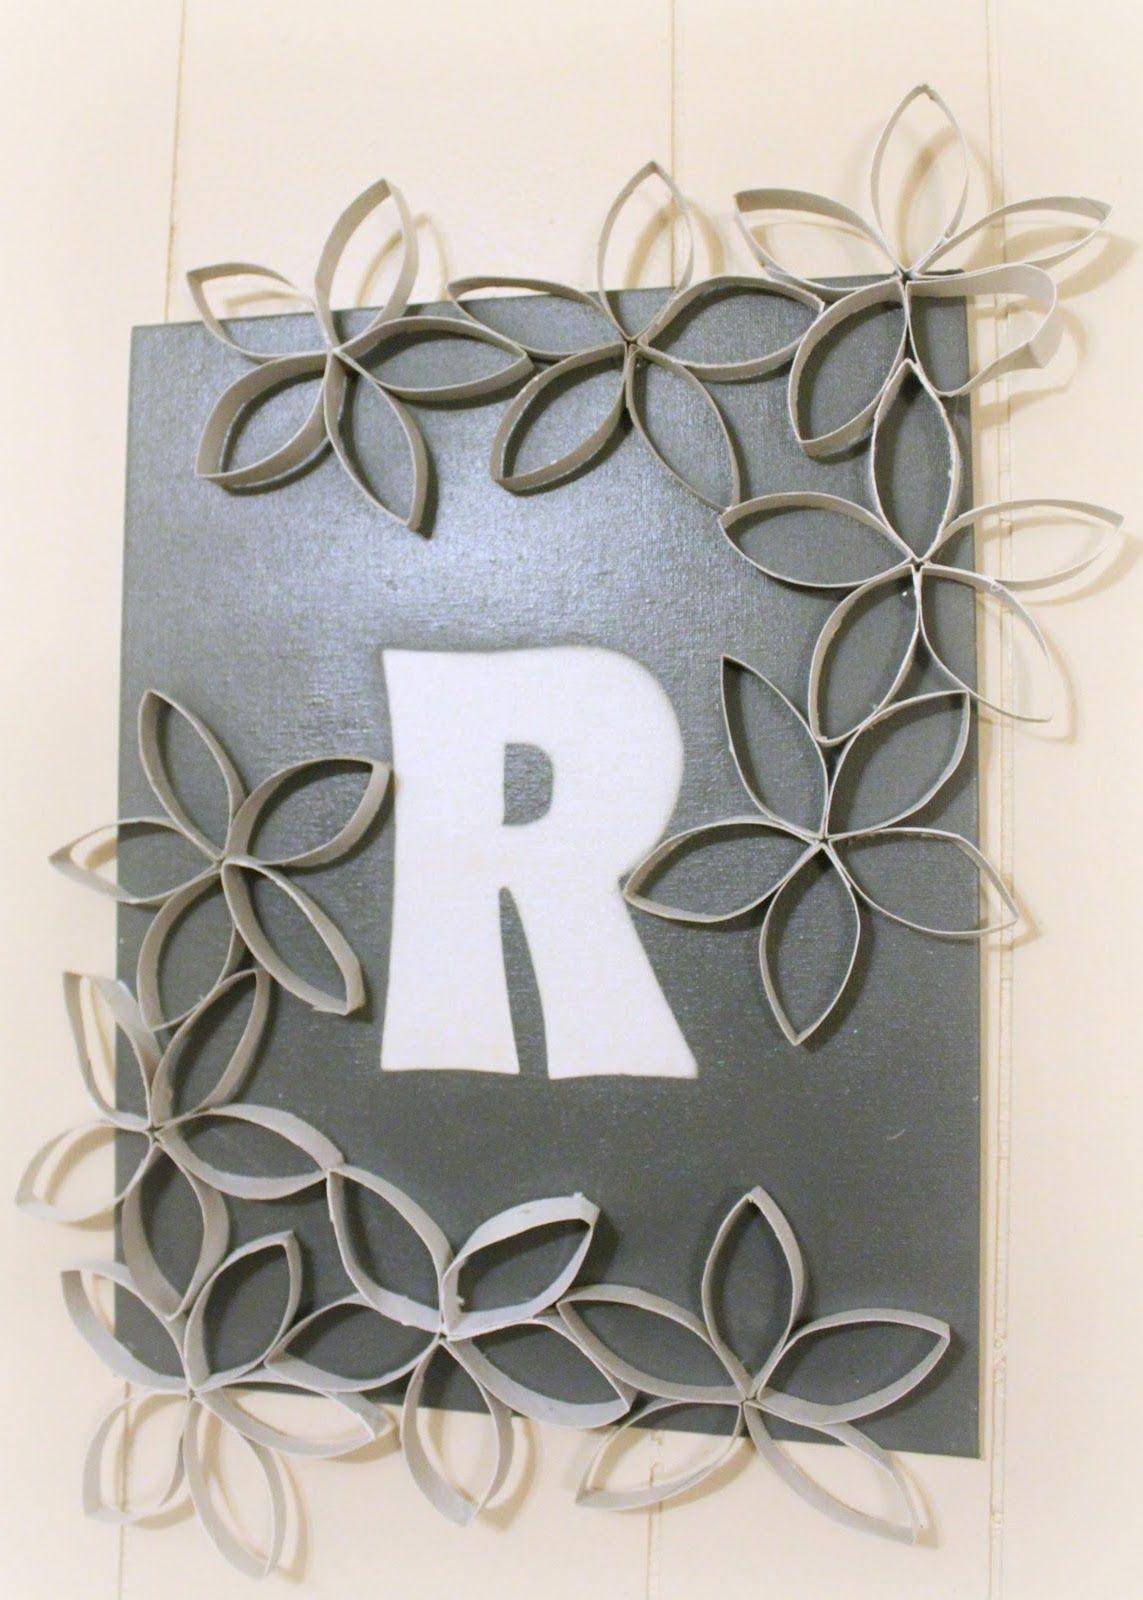 Pin by linda roberts on raeroberts pinterest paper roll art